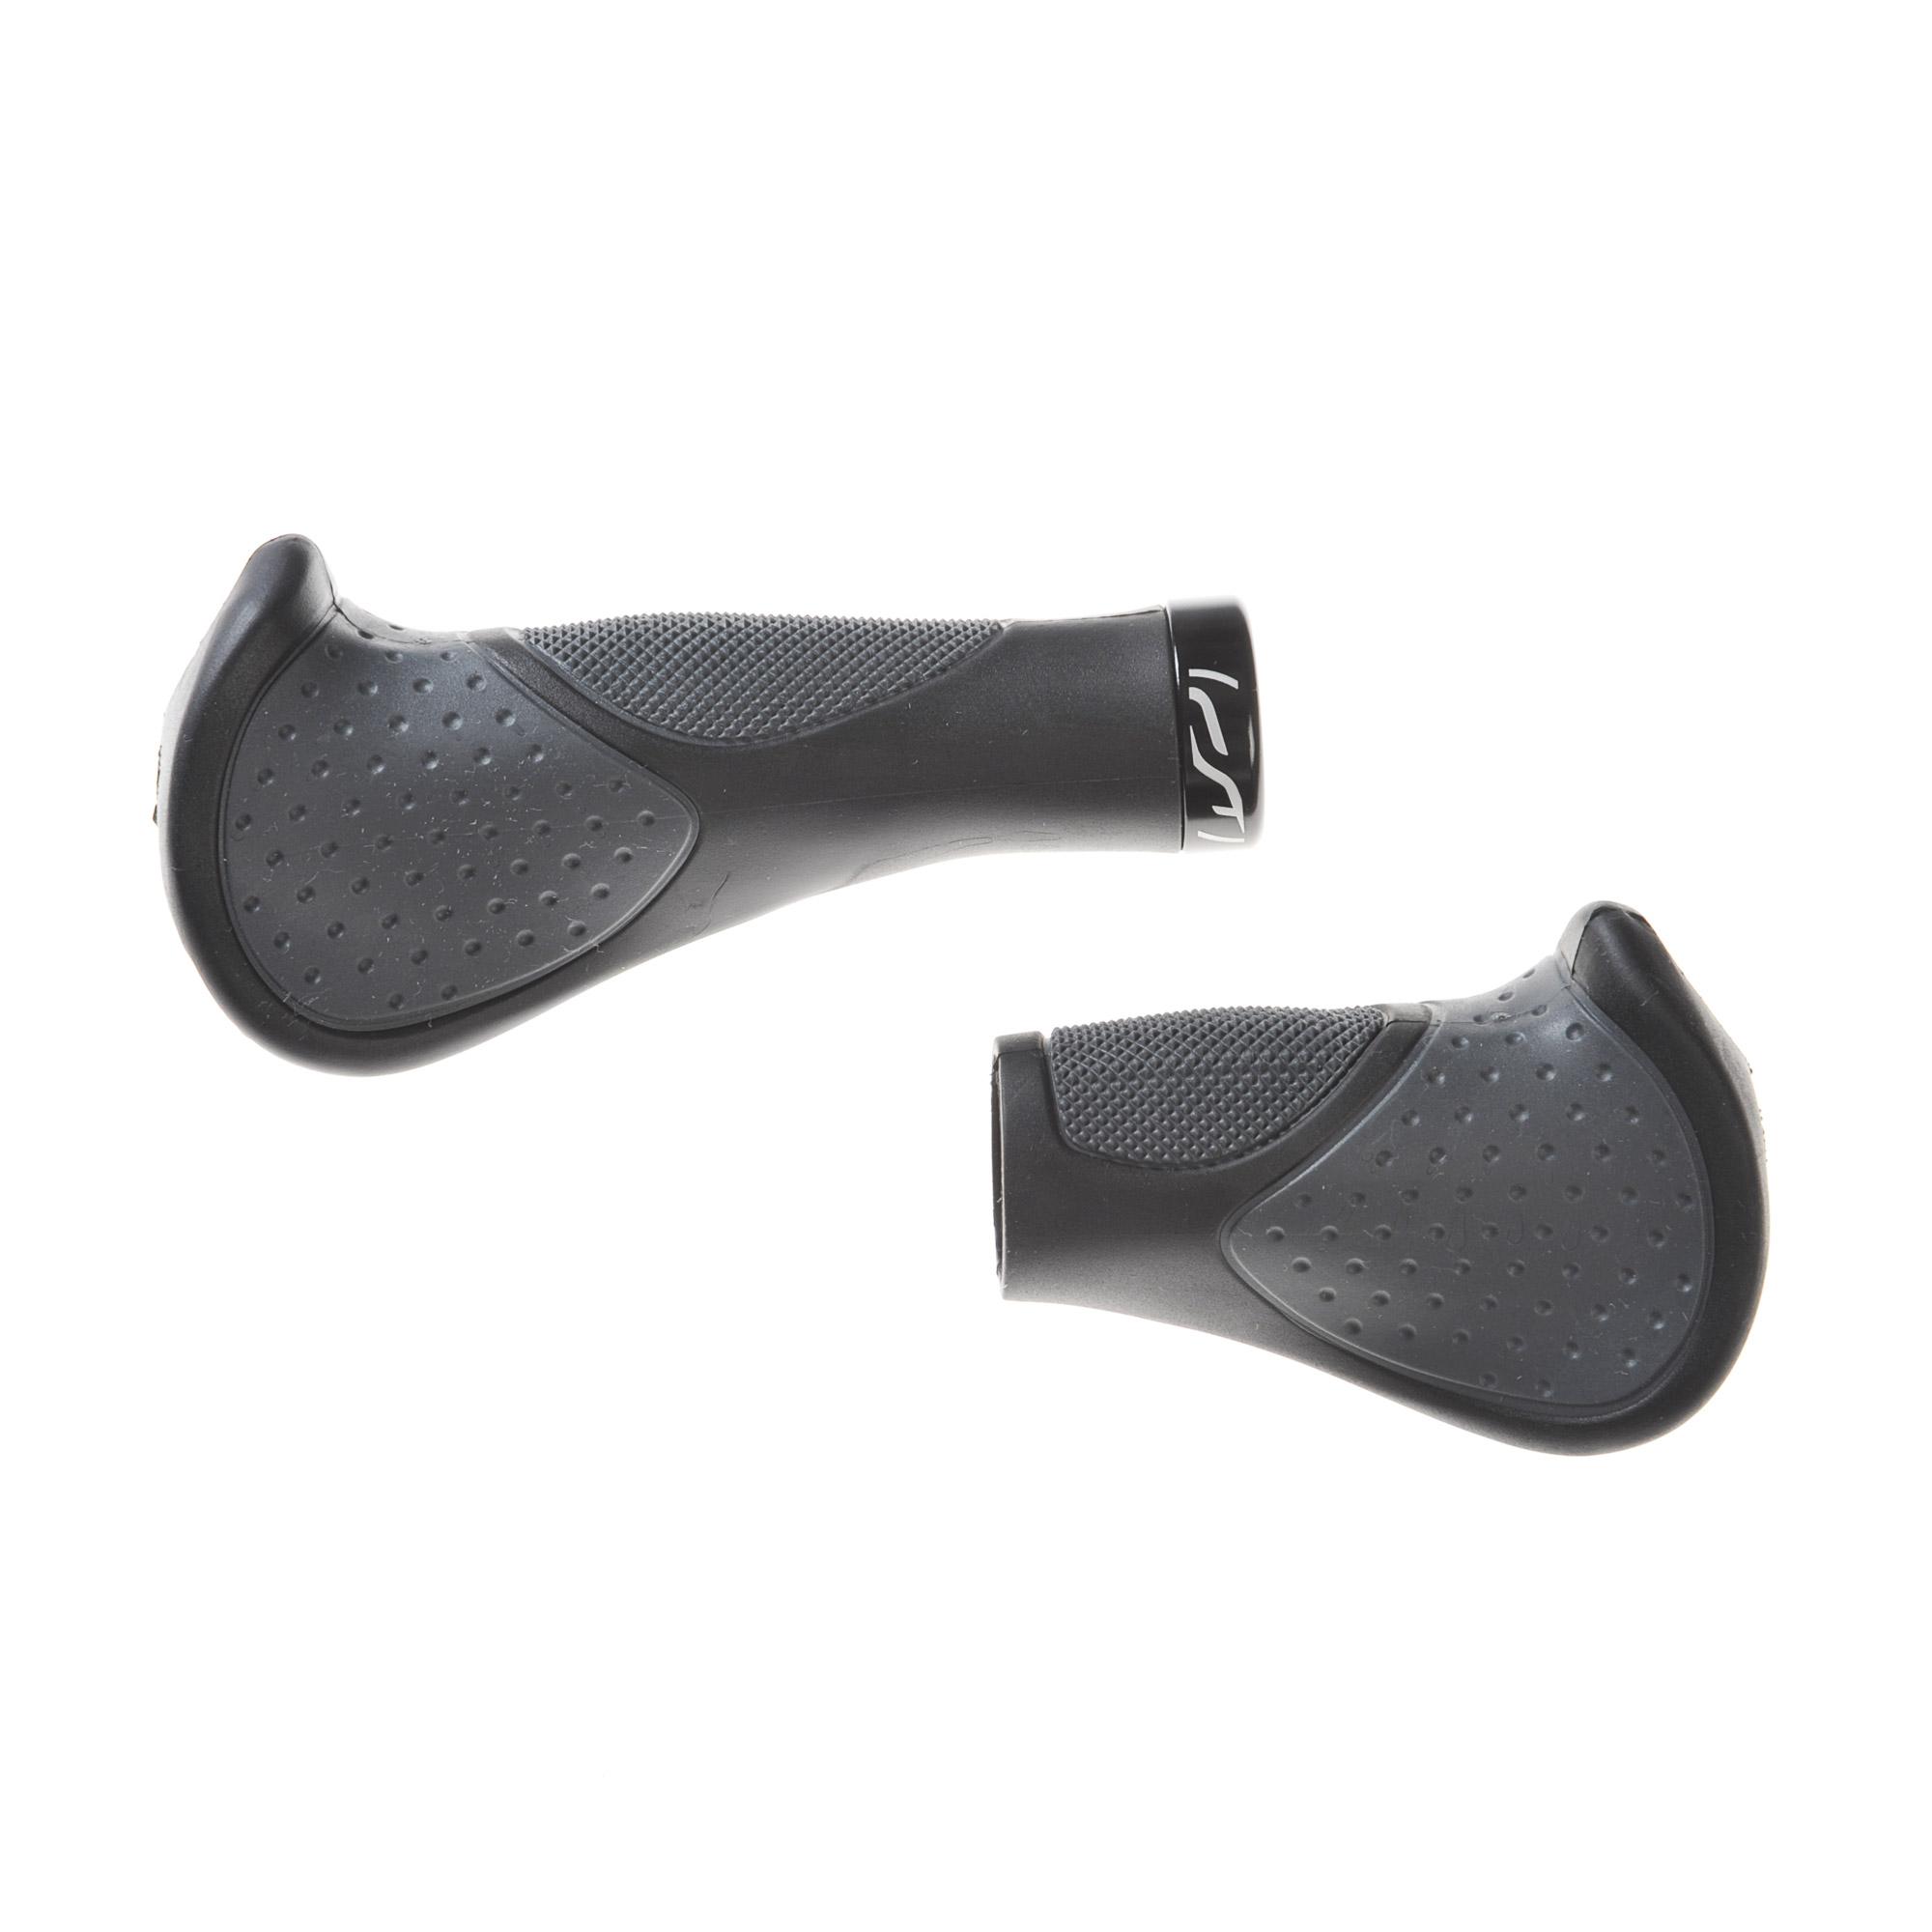 contec ergo fahrradgriffe ergonomisch schwarz ebay. Black Bedroom Furniture Sets. Home Design Ideas